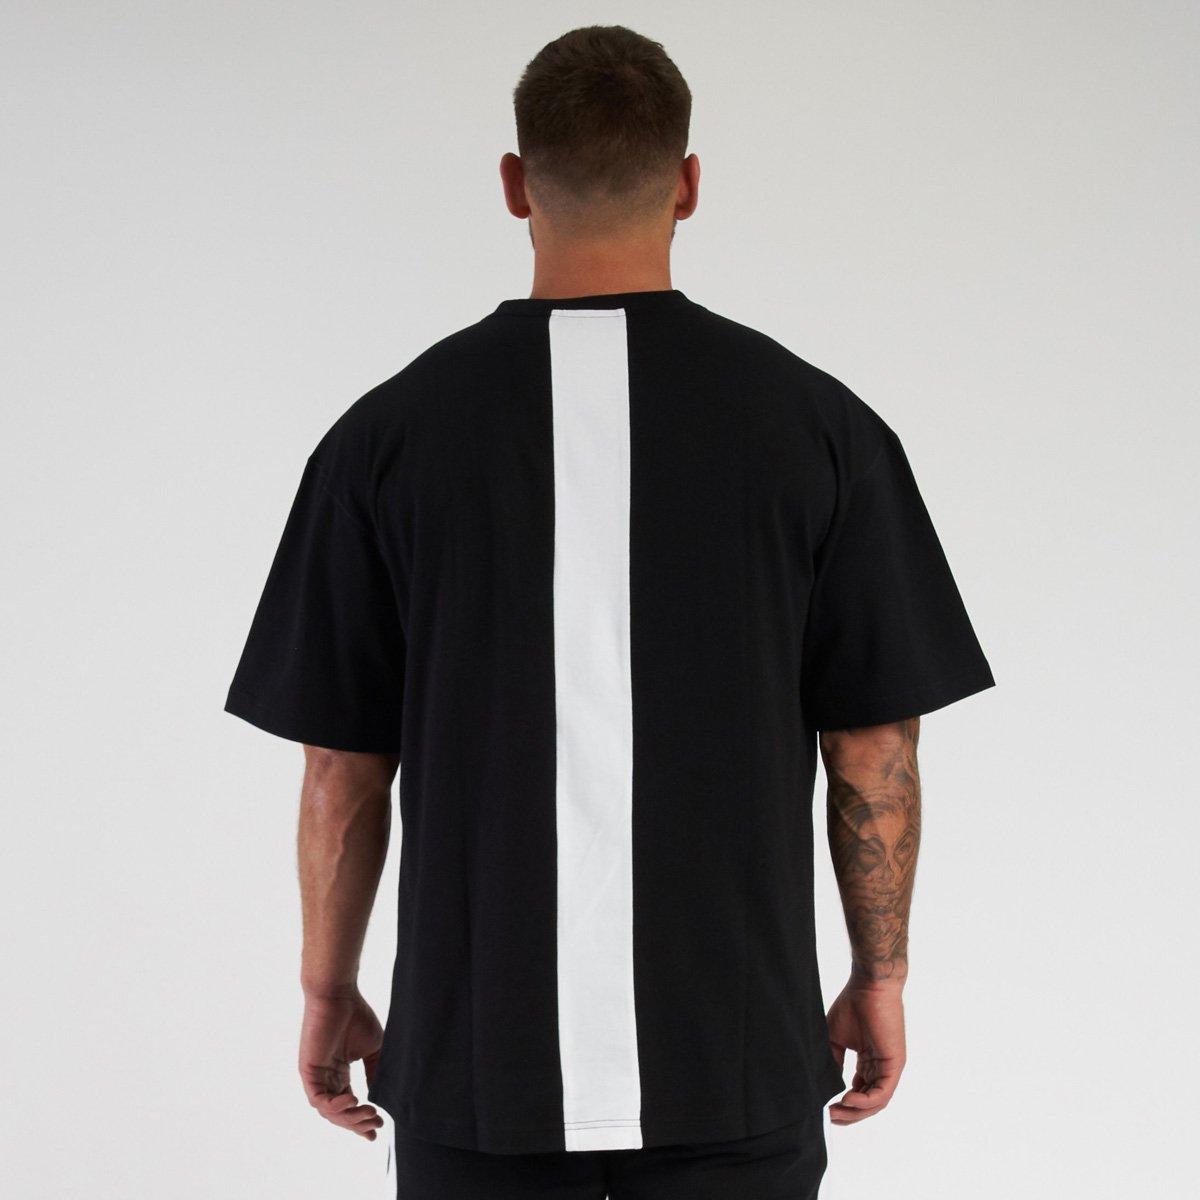 VANQUISH FITNES CONTRAST(コントラスト) Tシャツ